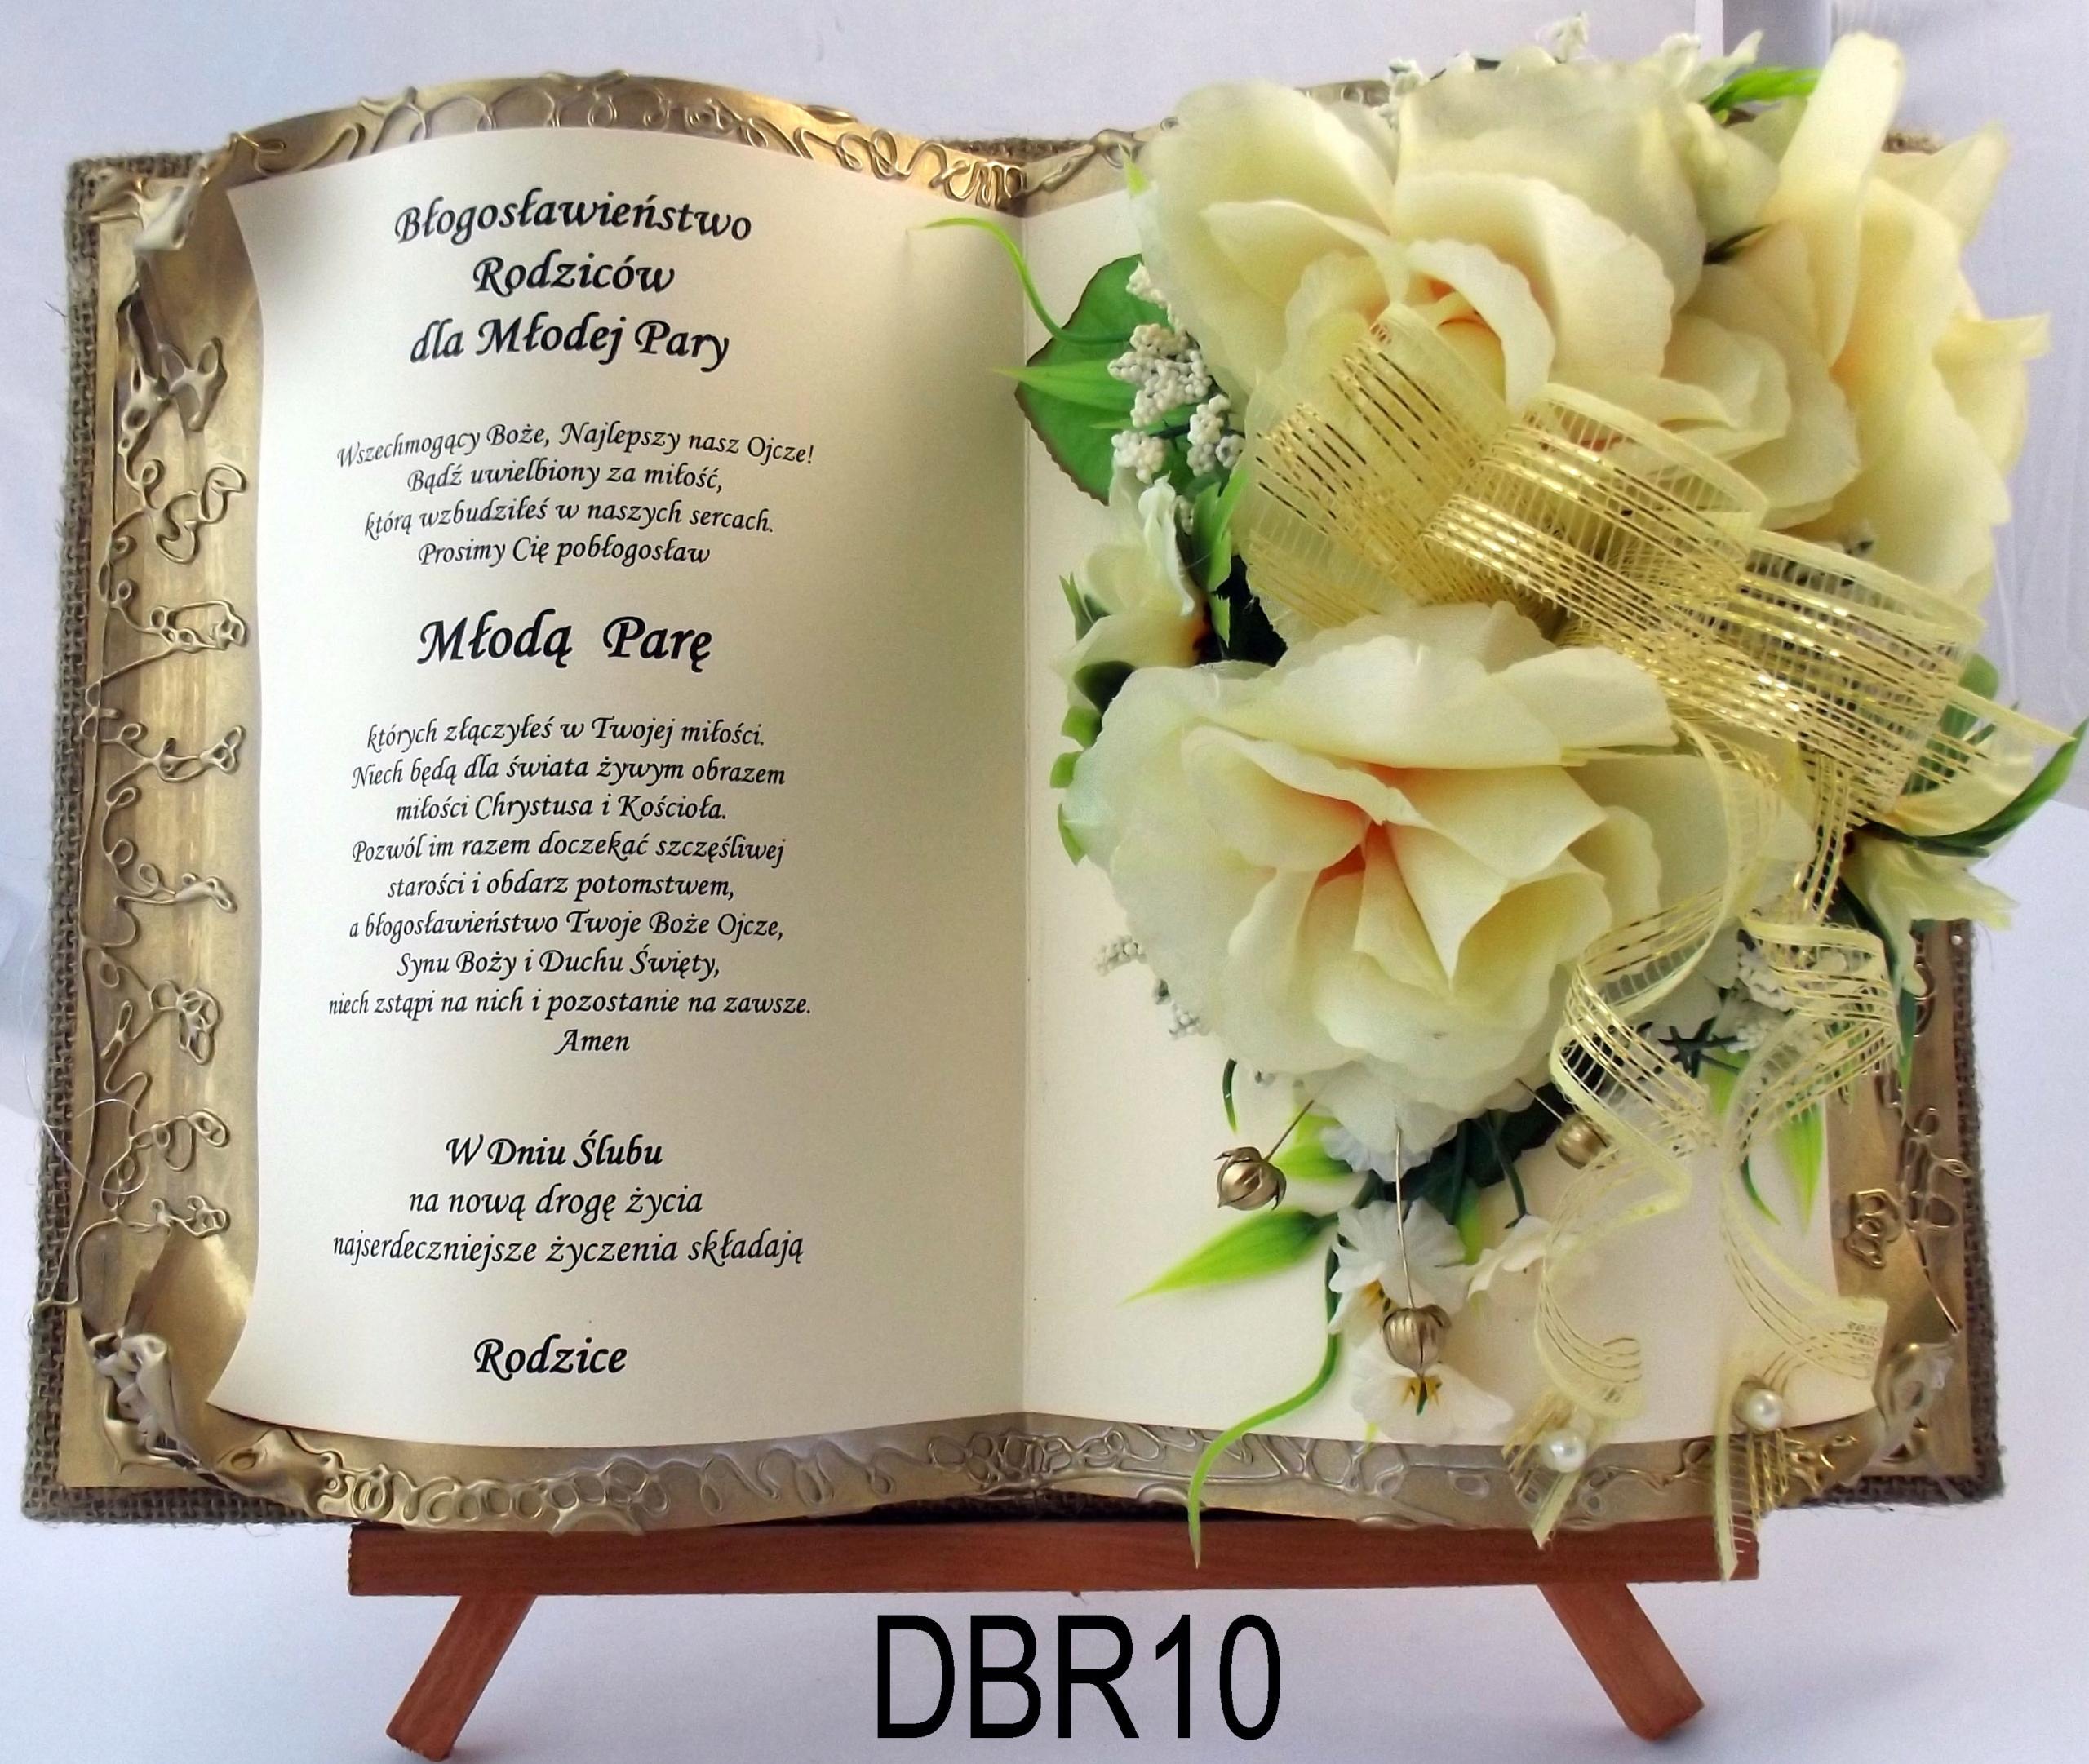 поздравление на свадьбу иегова концертная съемка